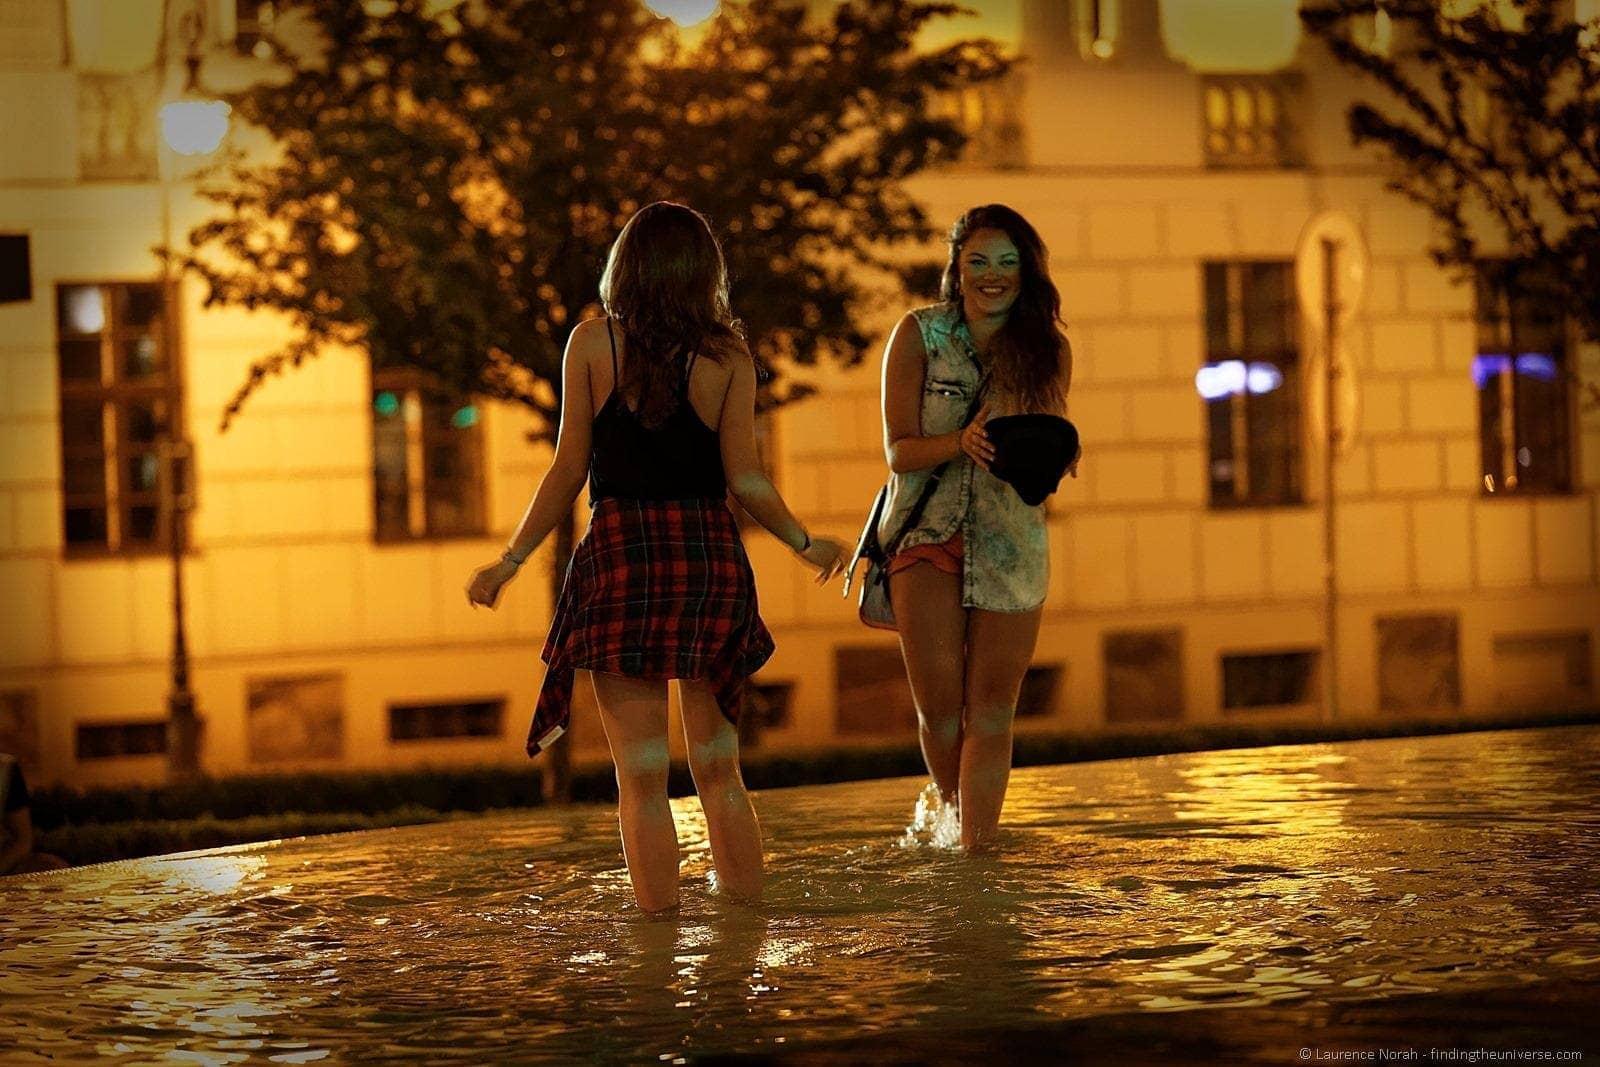 Girls dancing fountain freedom square malta festival poland